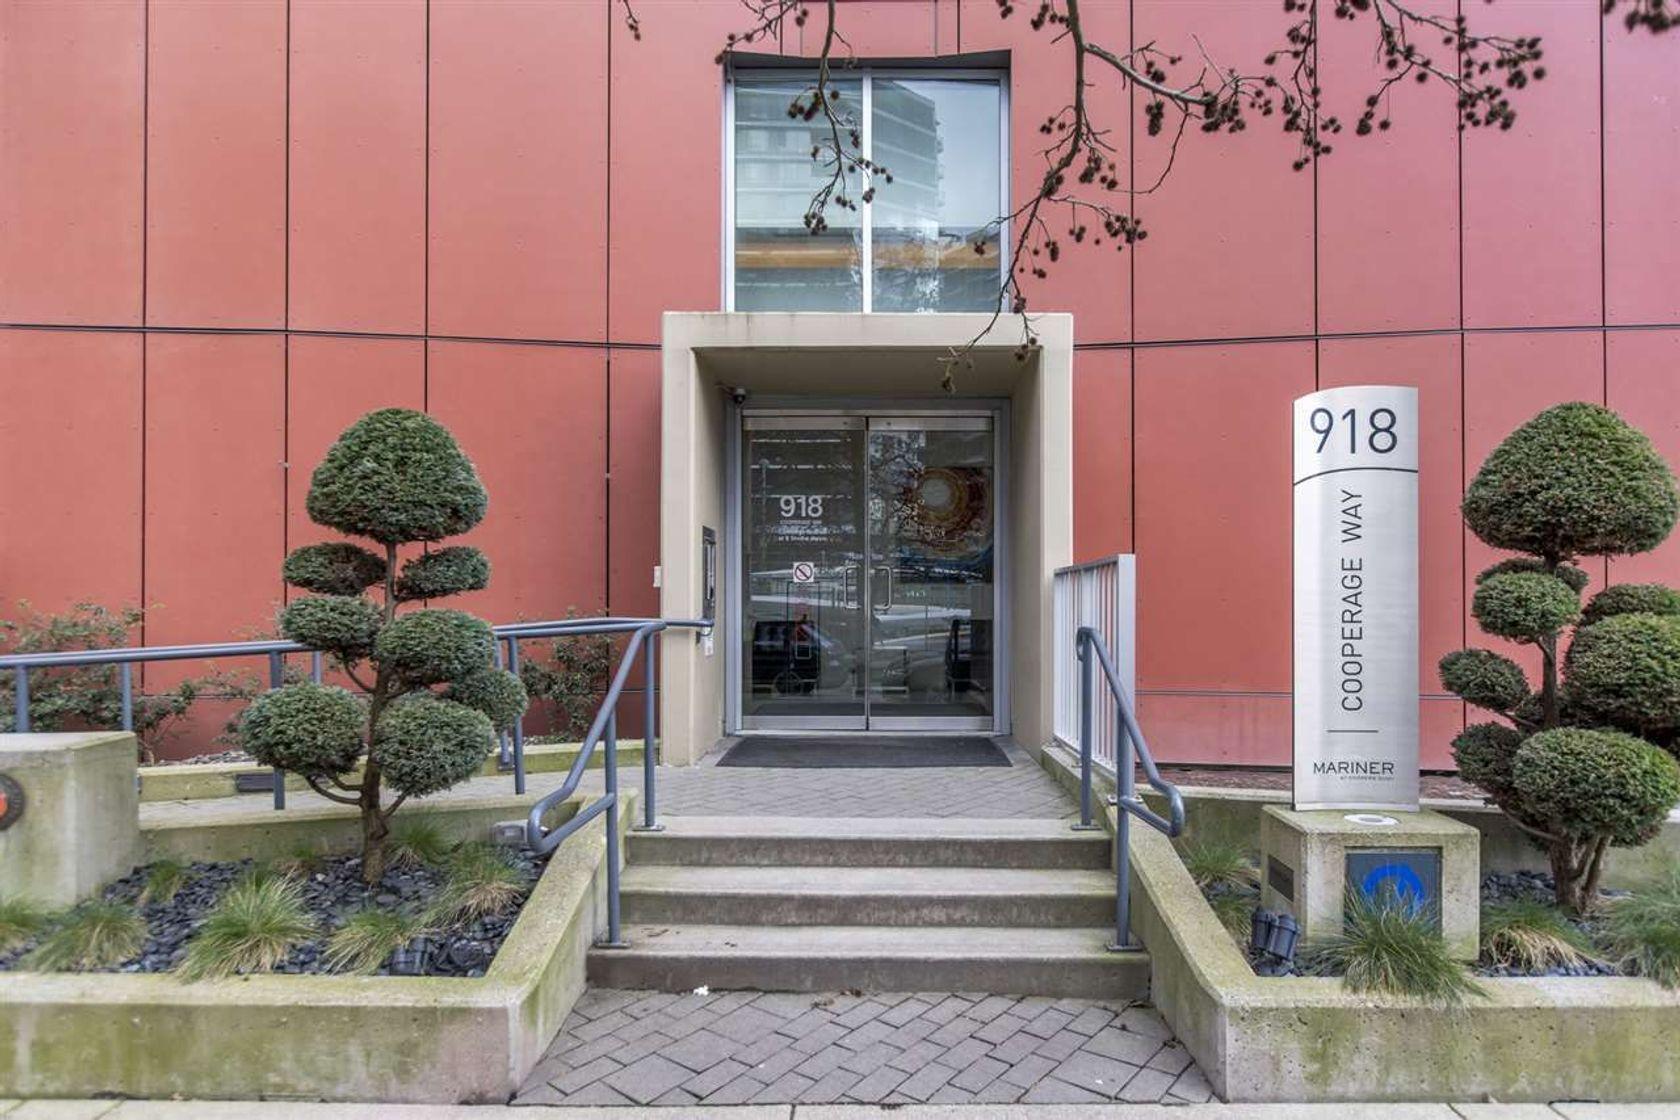 918-cooperage-way-yaletown-vancouver-west-05 at 2206 - 918 Cooperage Way, Cooperage Park (Yaletown), Vancouver West